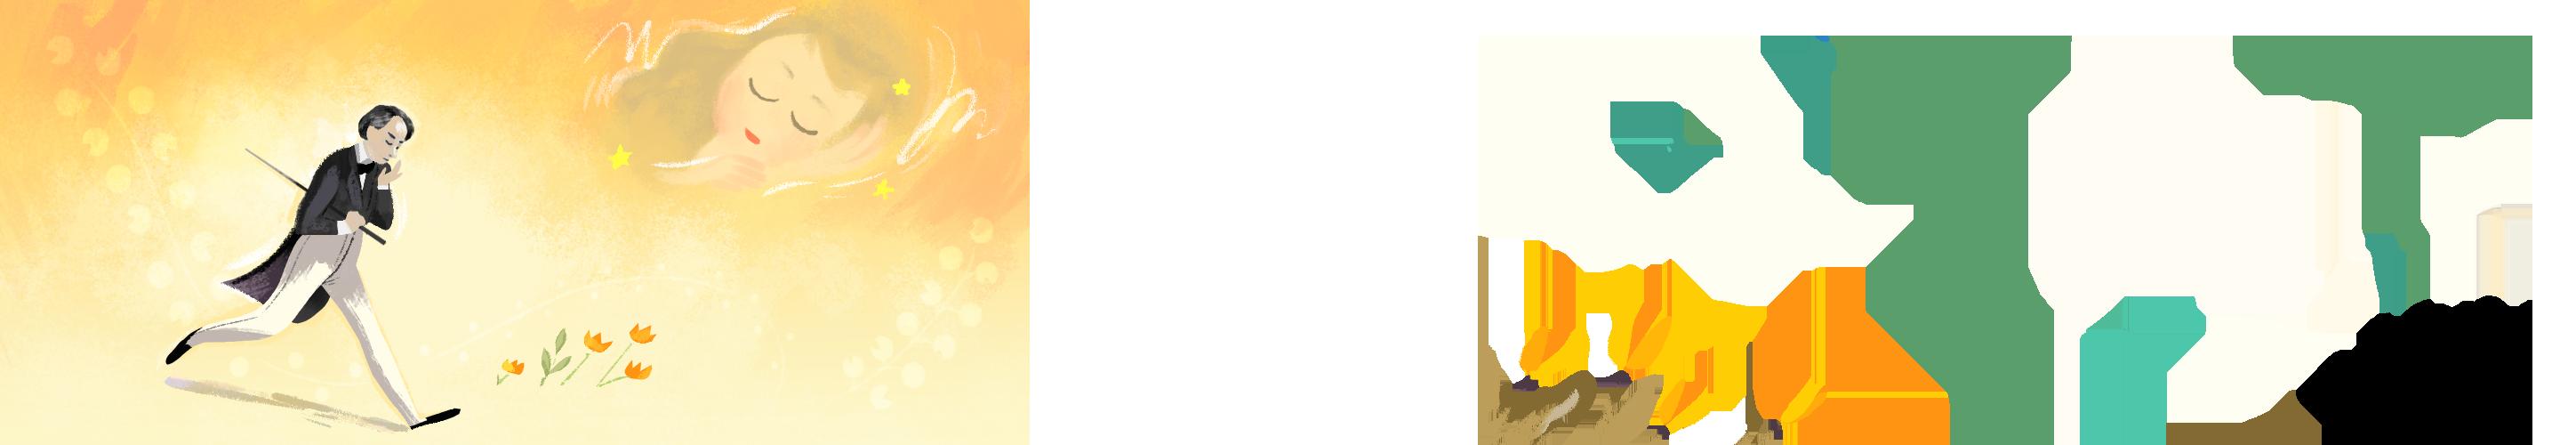 Icc Champions Trophy 2017 Begins